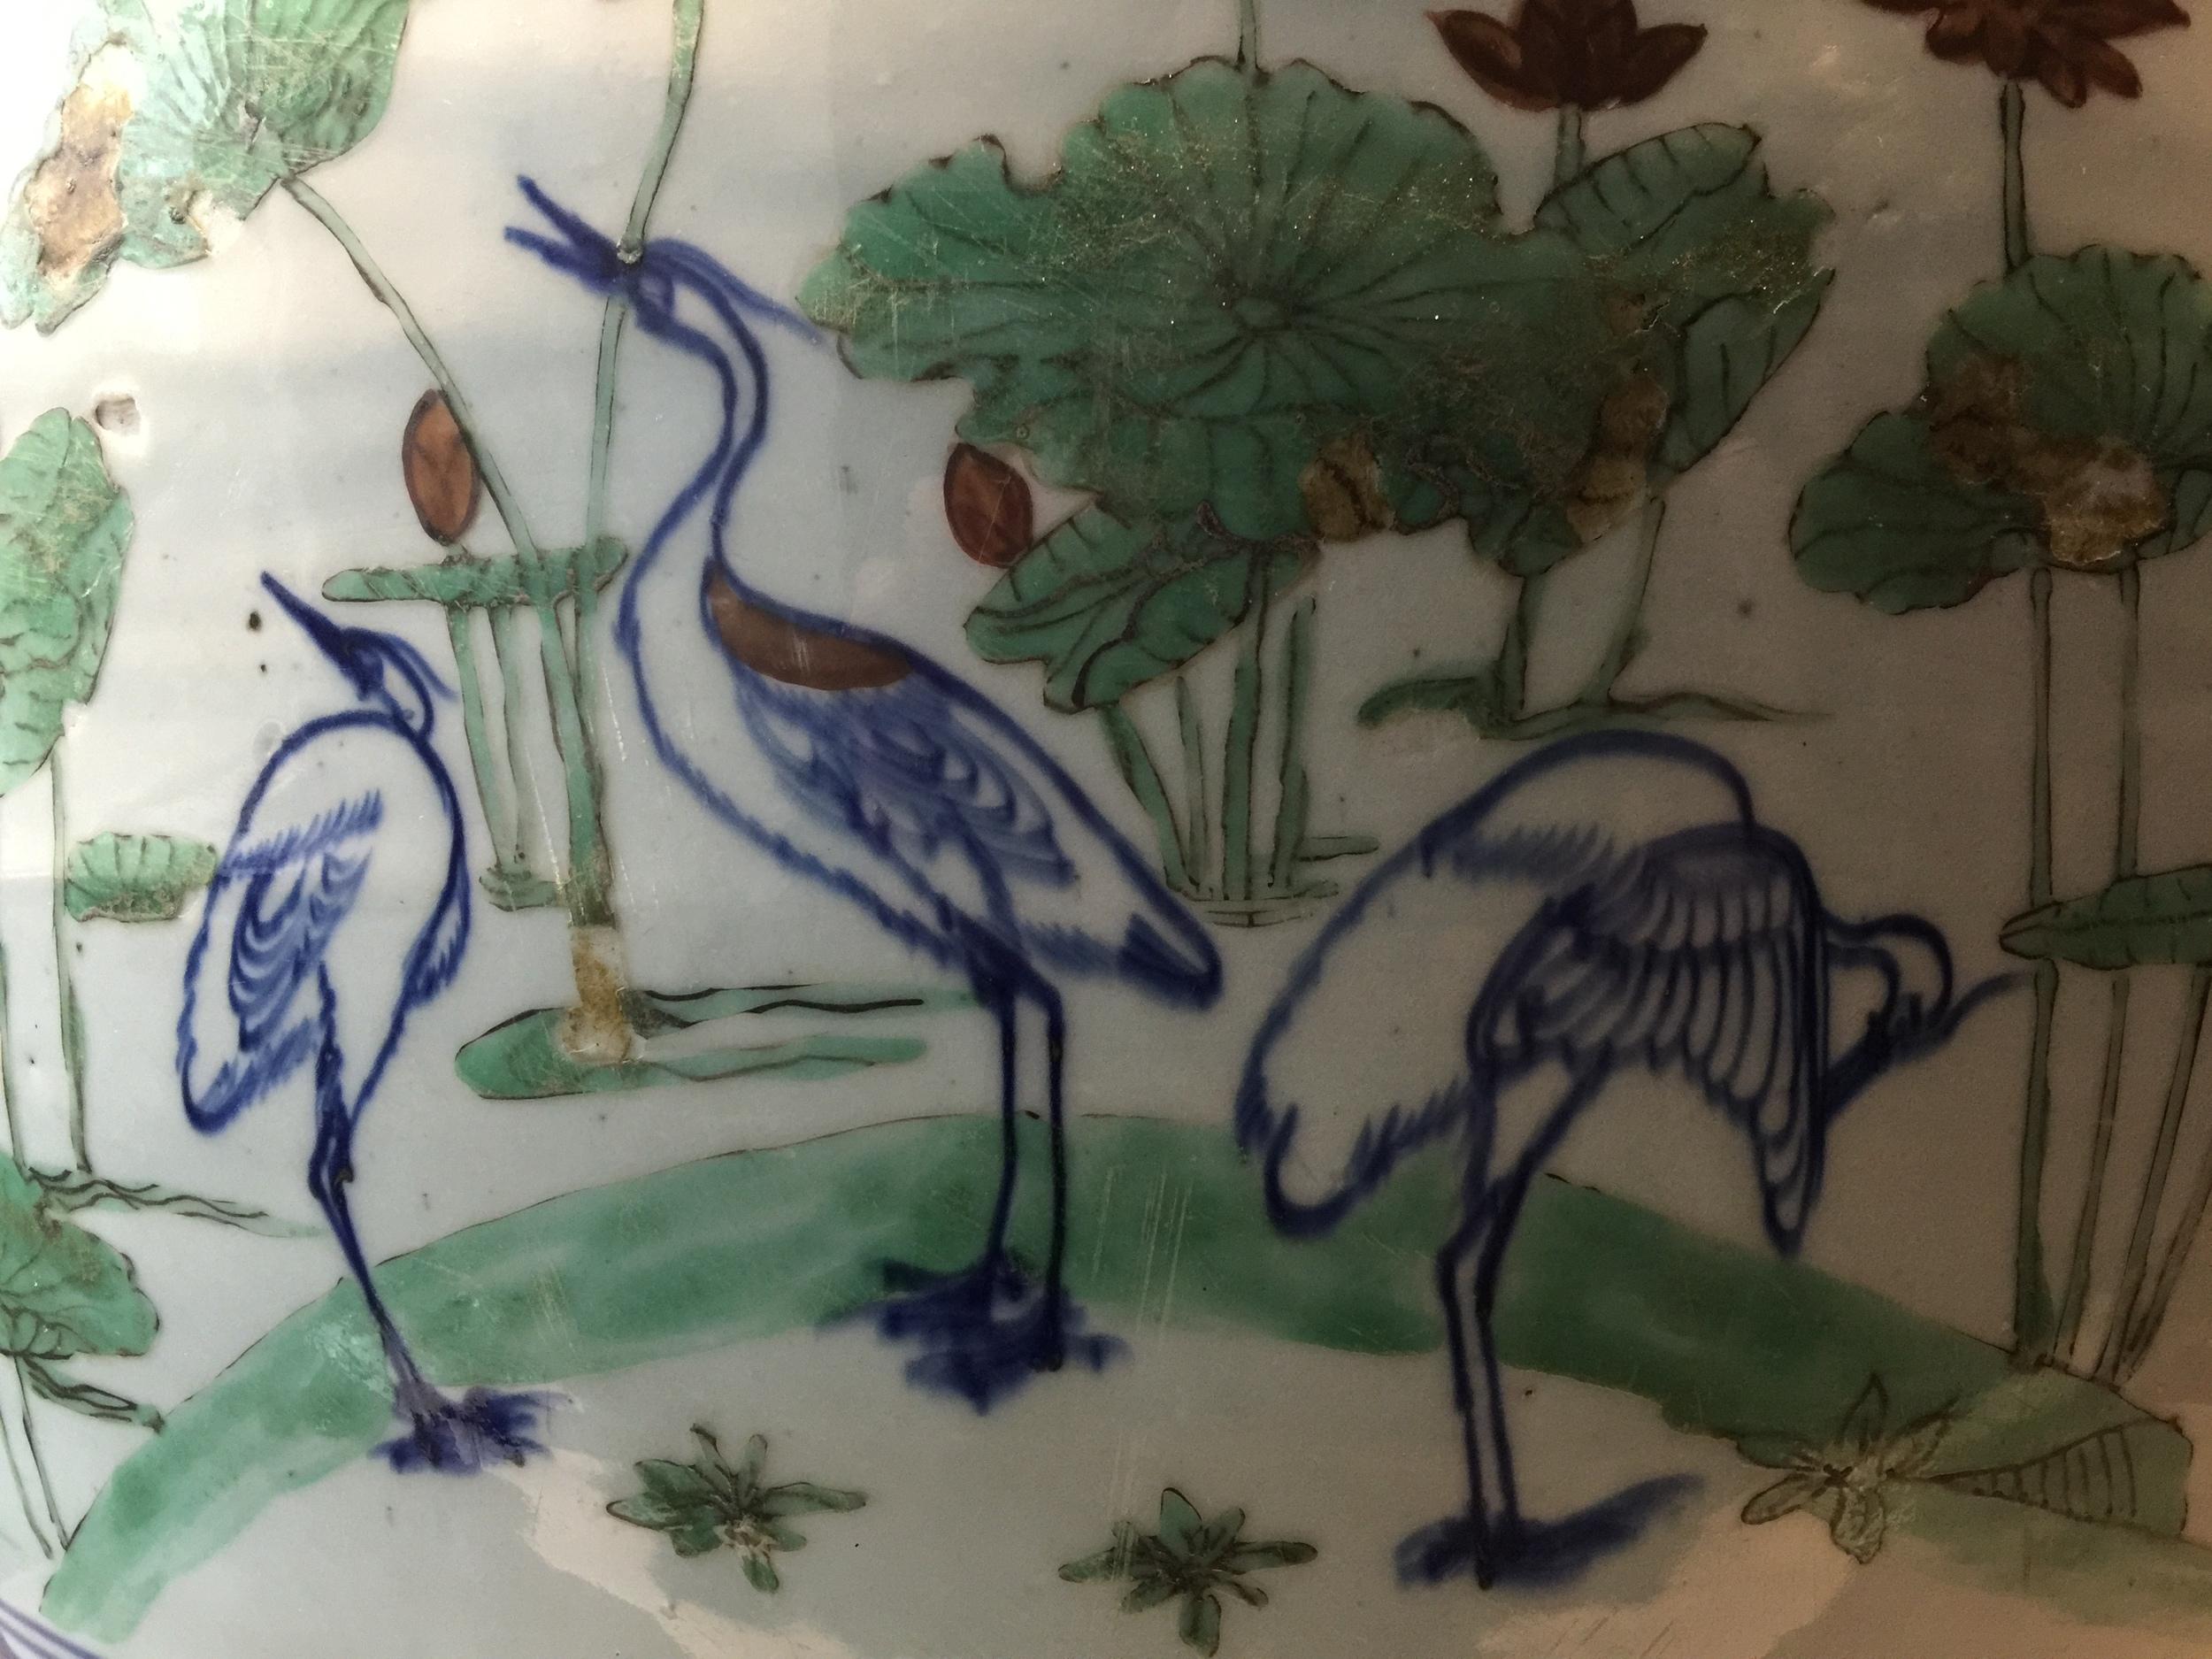 Chinese-Porcelain-British-Museum-Percival-David-jessewaugh.com-31.jpg